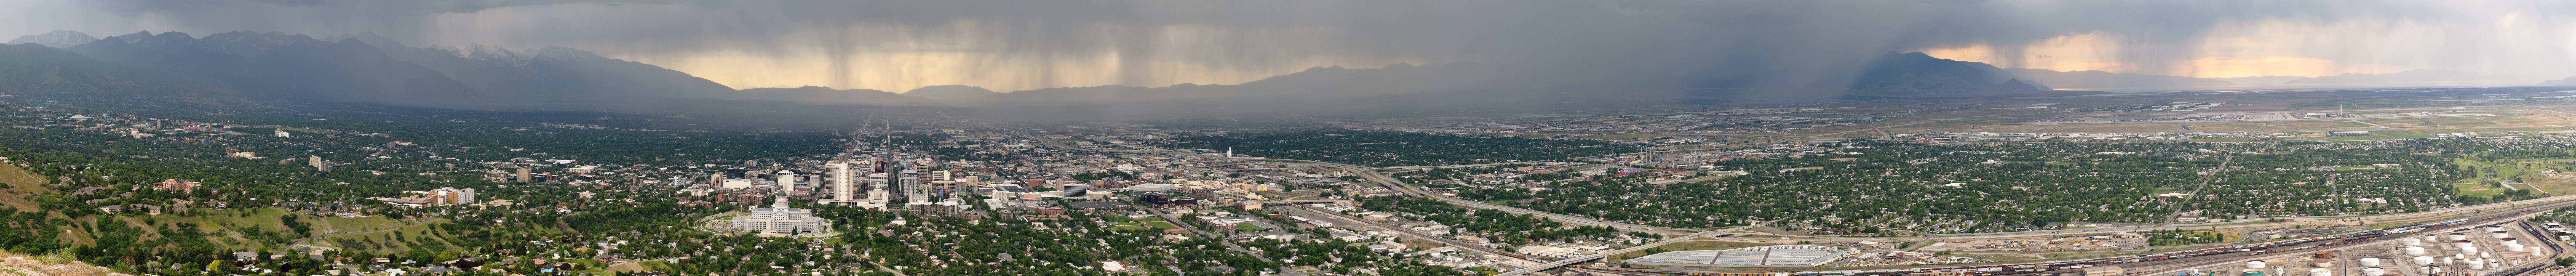 Salt Lake City Time Zone Map.Salt Lake City Utah Population 2019 Demographics Maps Graphs